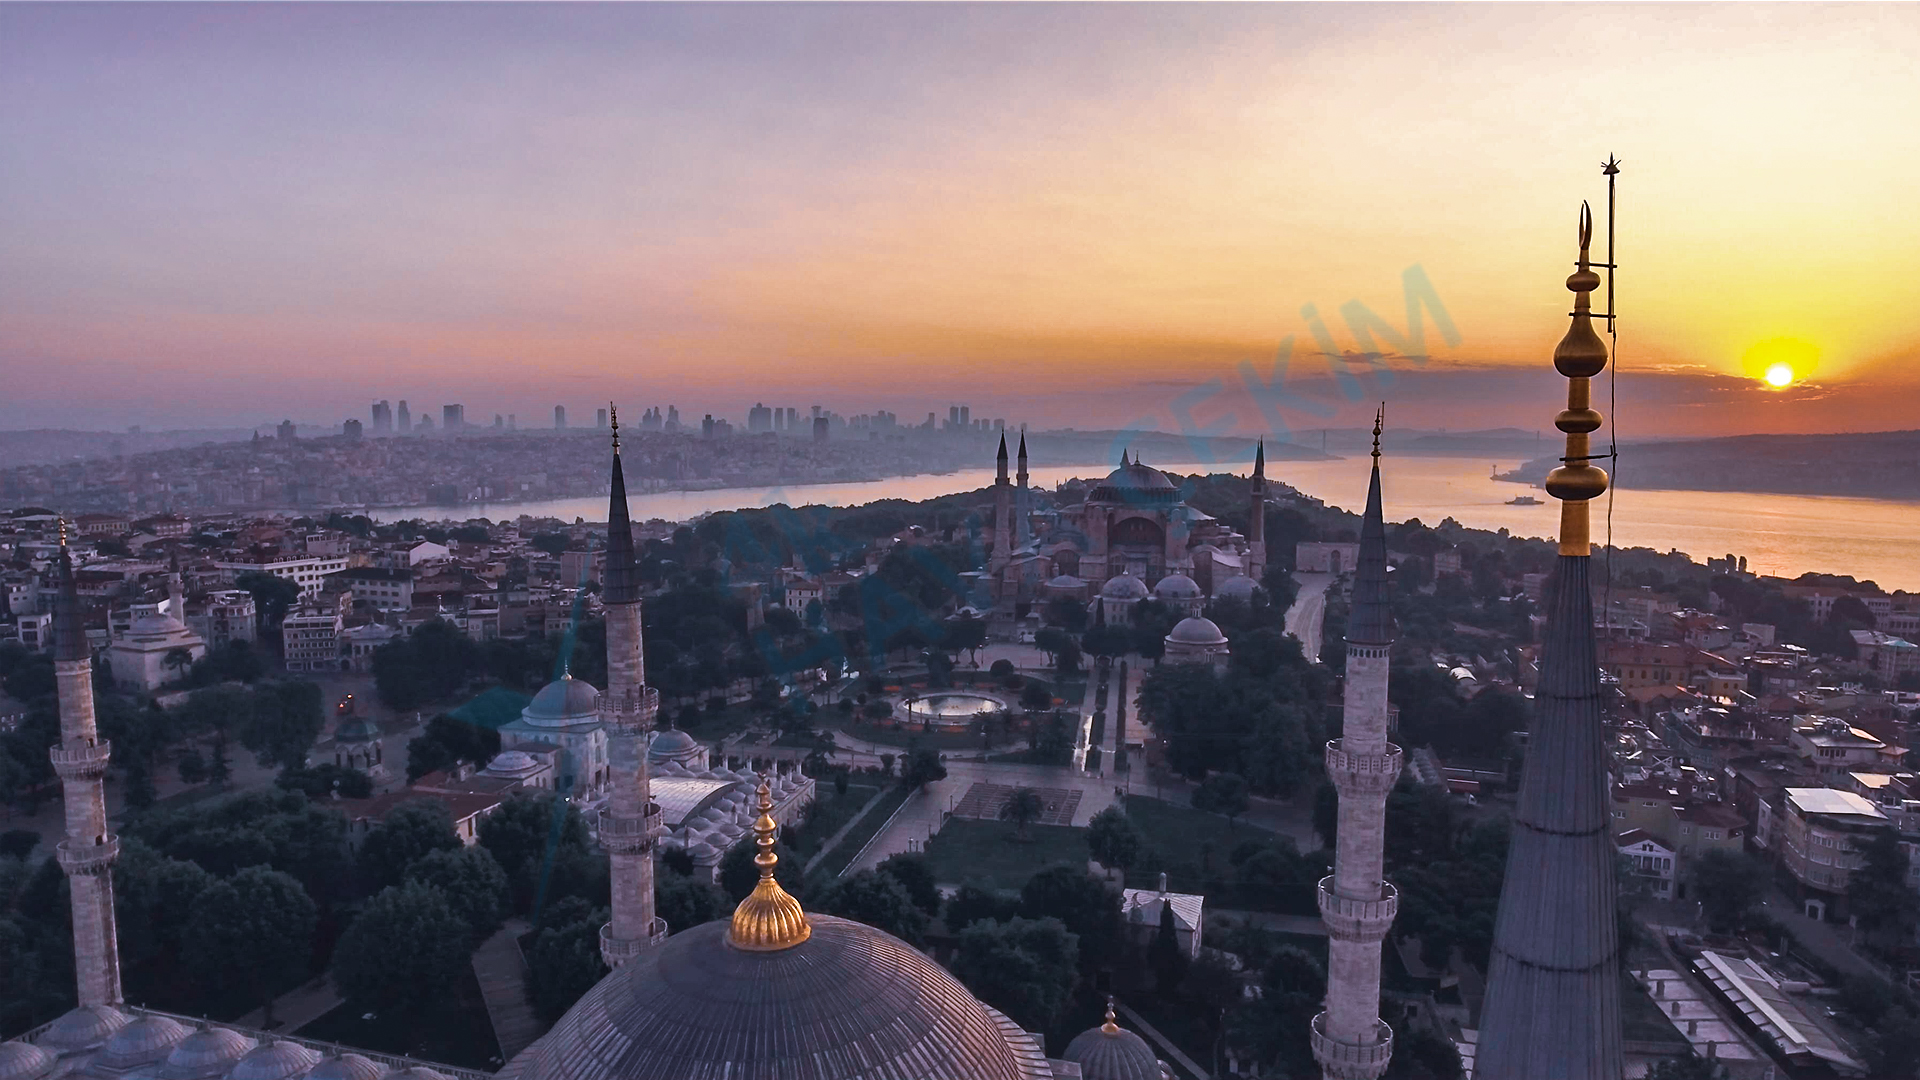 İSTANBUL DRONE KİRALAMA HİZMETLERİ